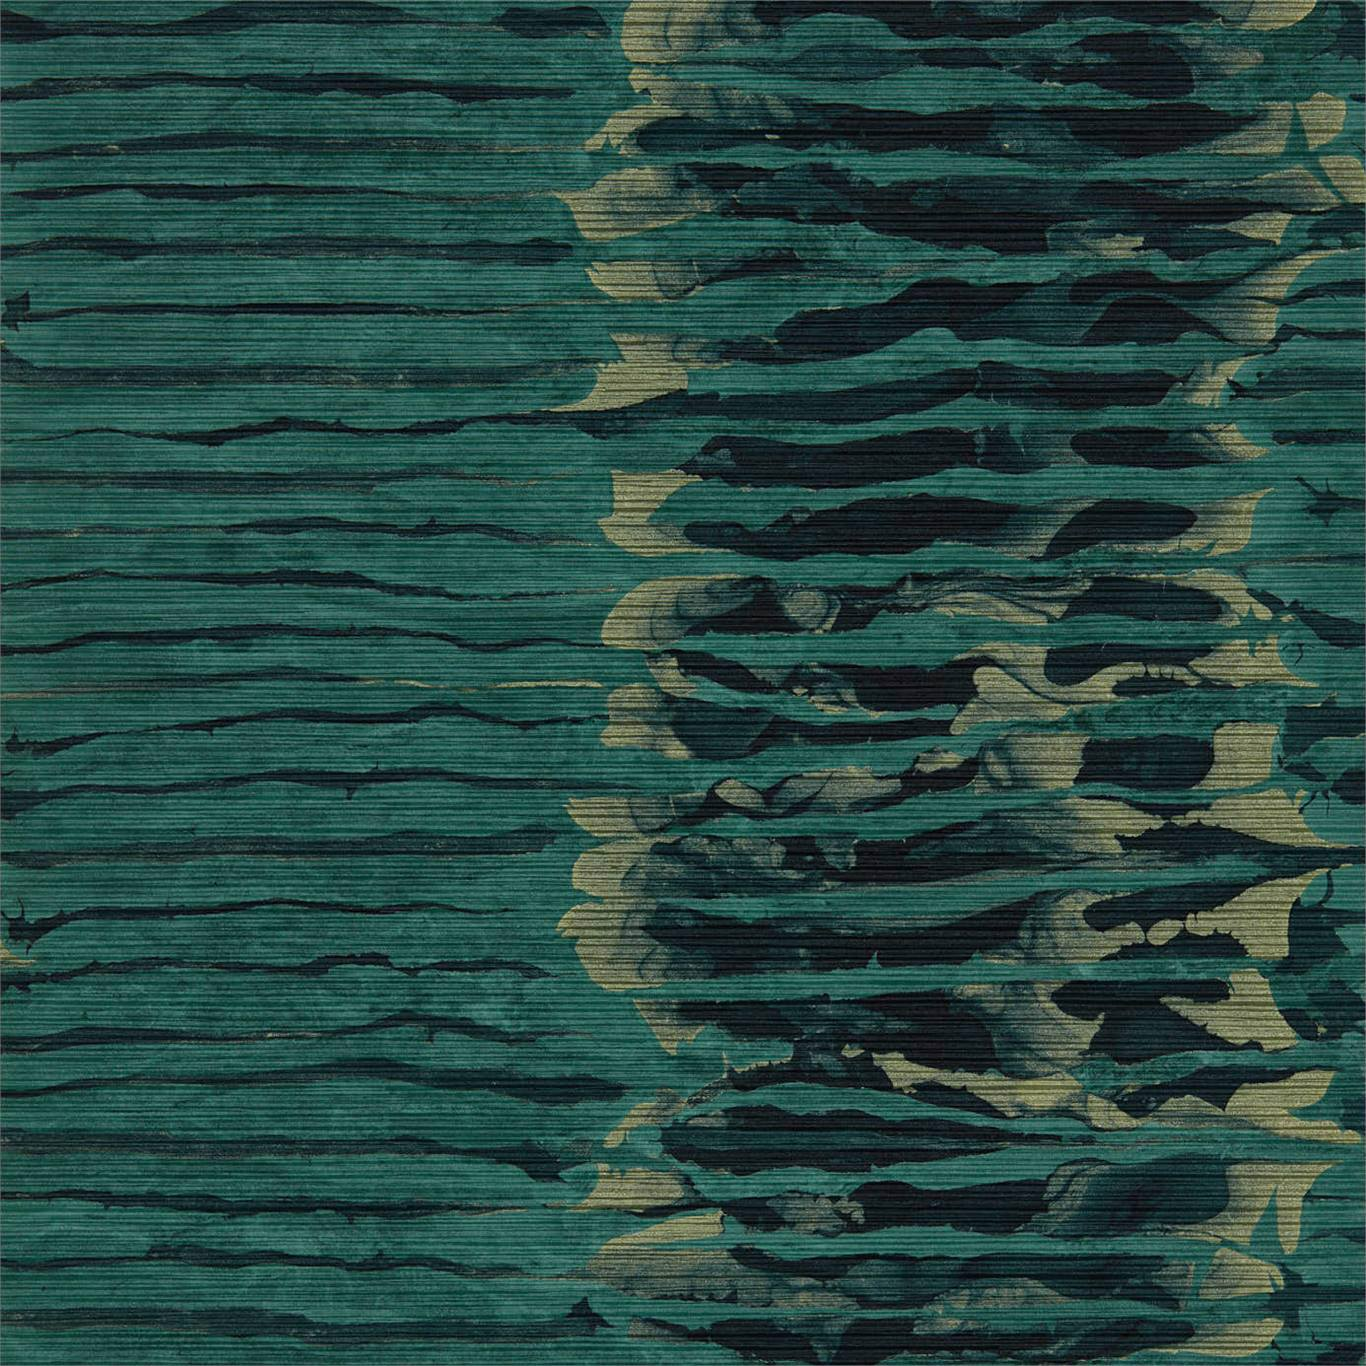 Ripple Stripe by ANT